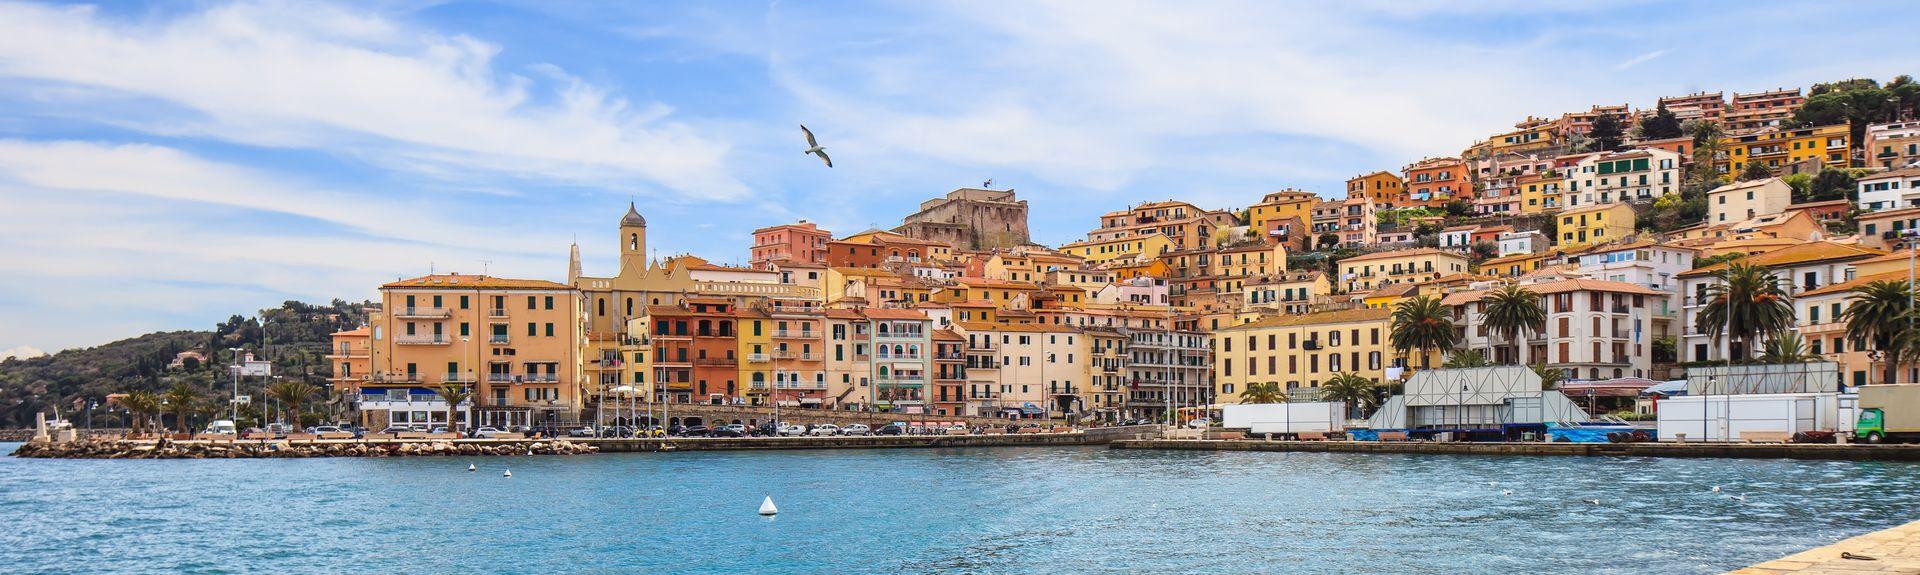 Porto Santo Stefano, Toscana, Italien